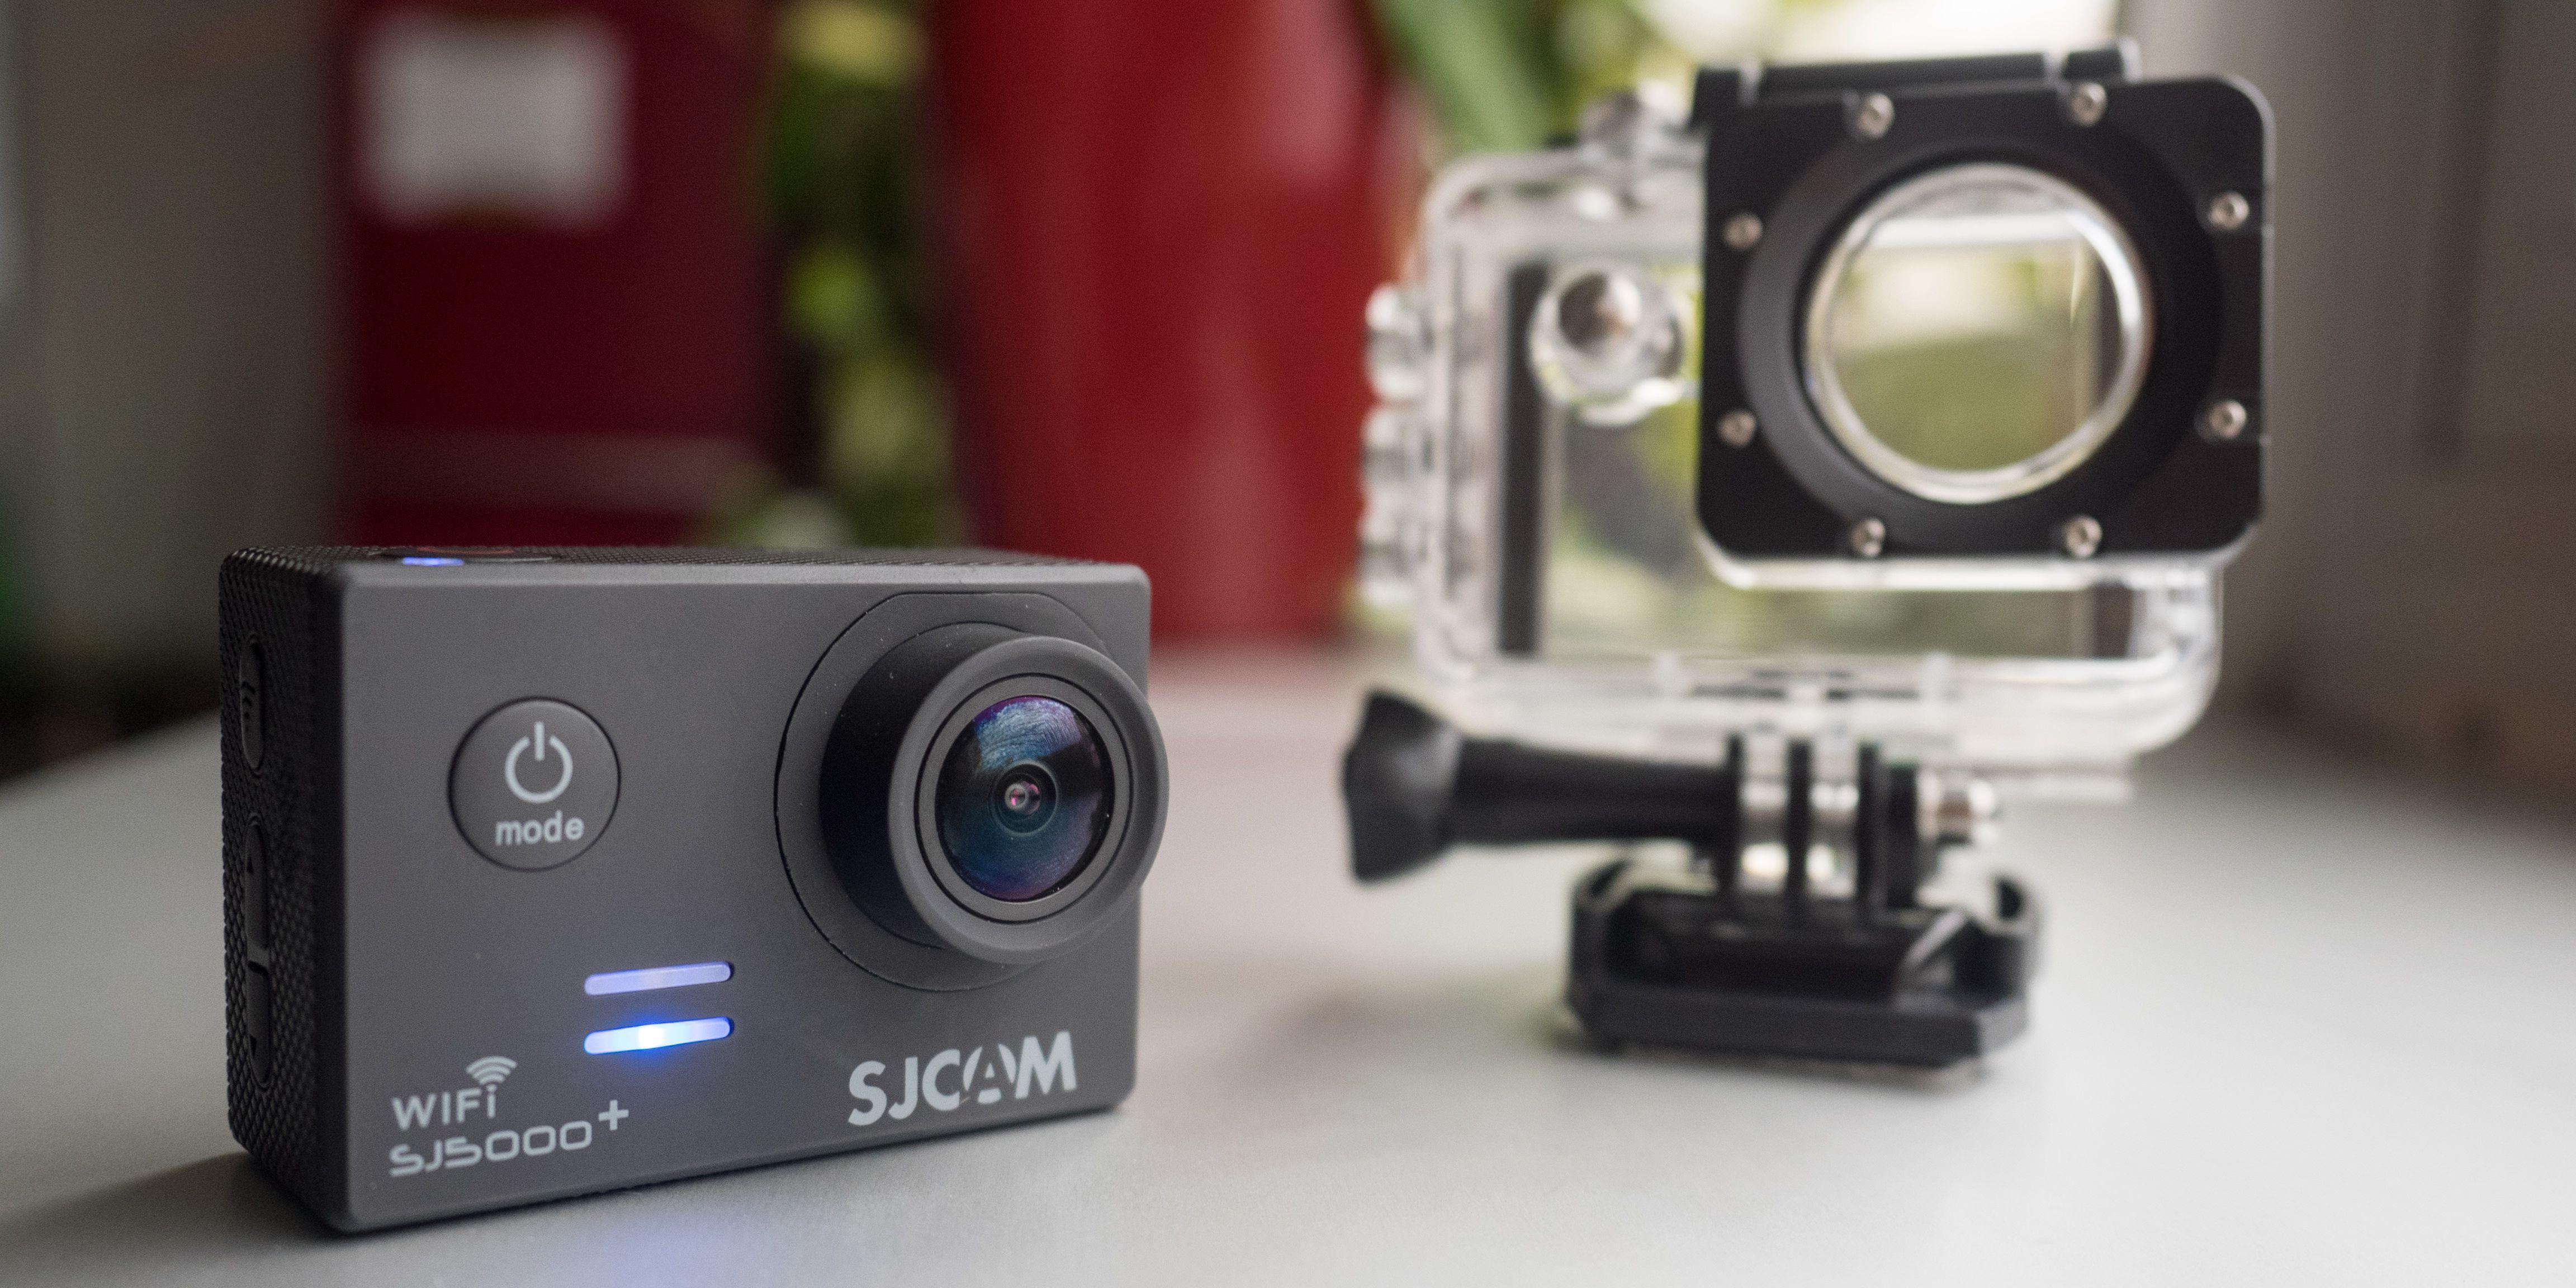 SJCAM 5000 plus LMDN3